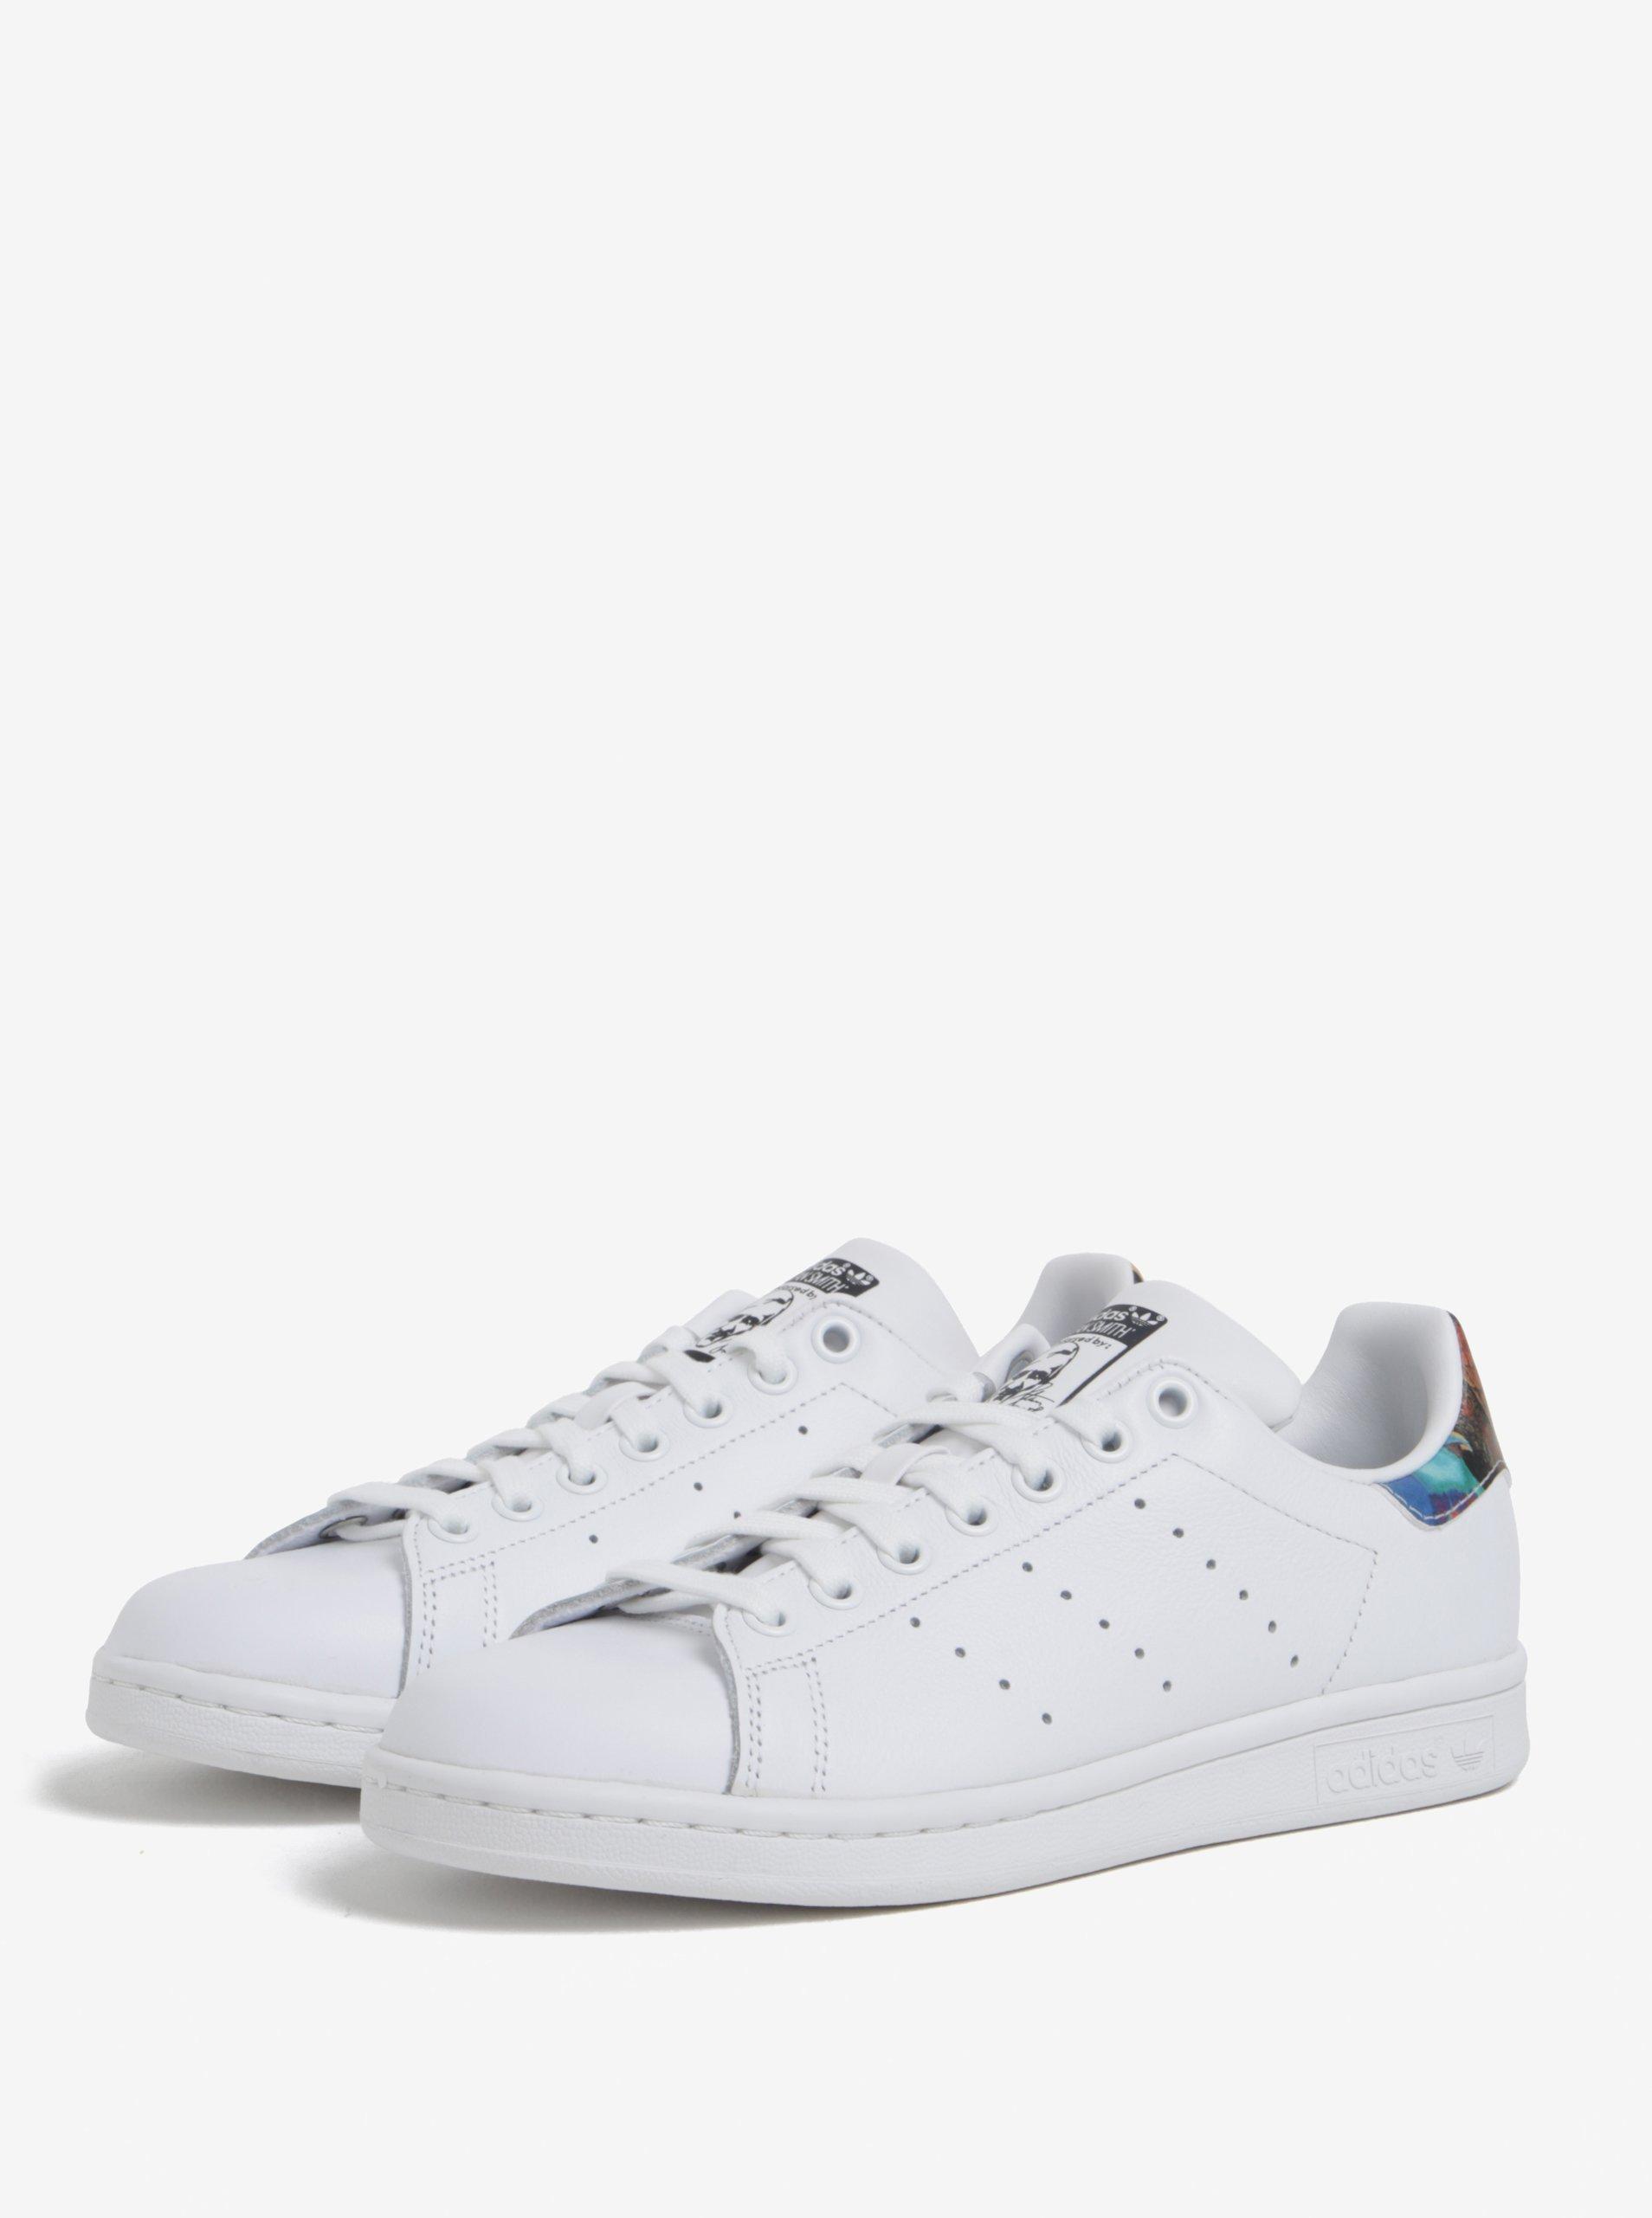 Bílé dámské tenisky s barevným detailem adidas Originals Stan Smith ... 38116fda3d5